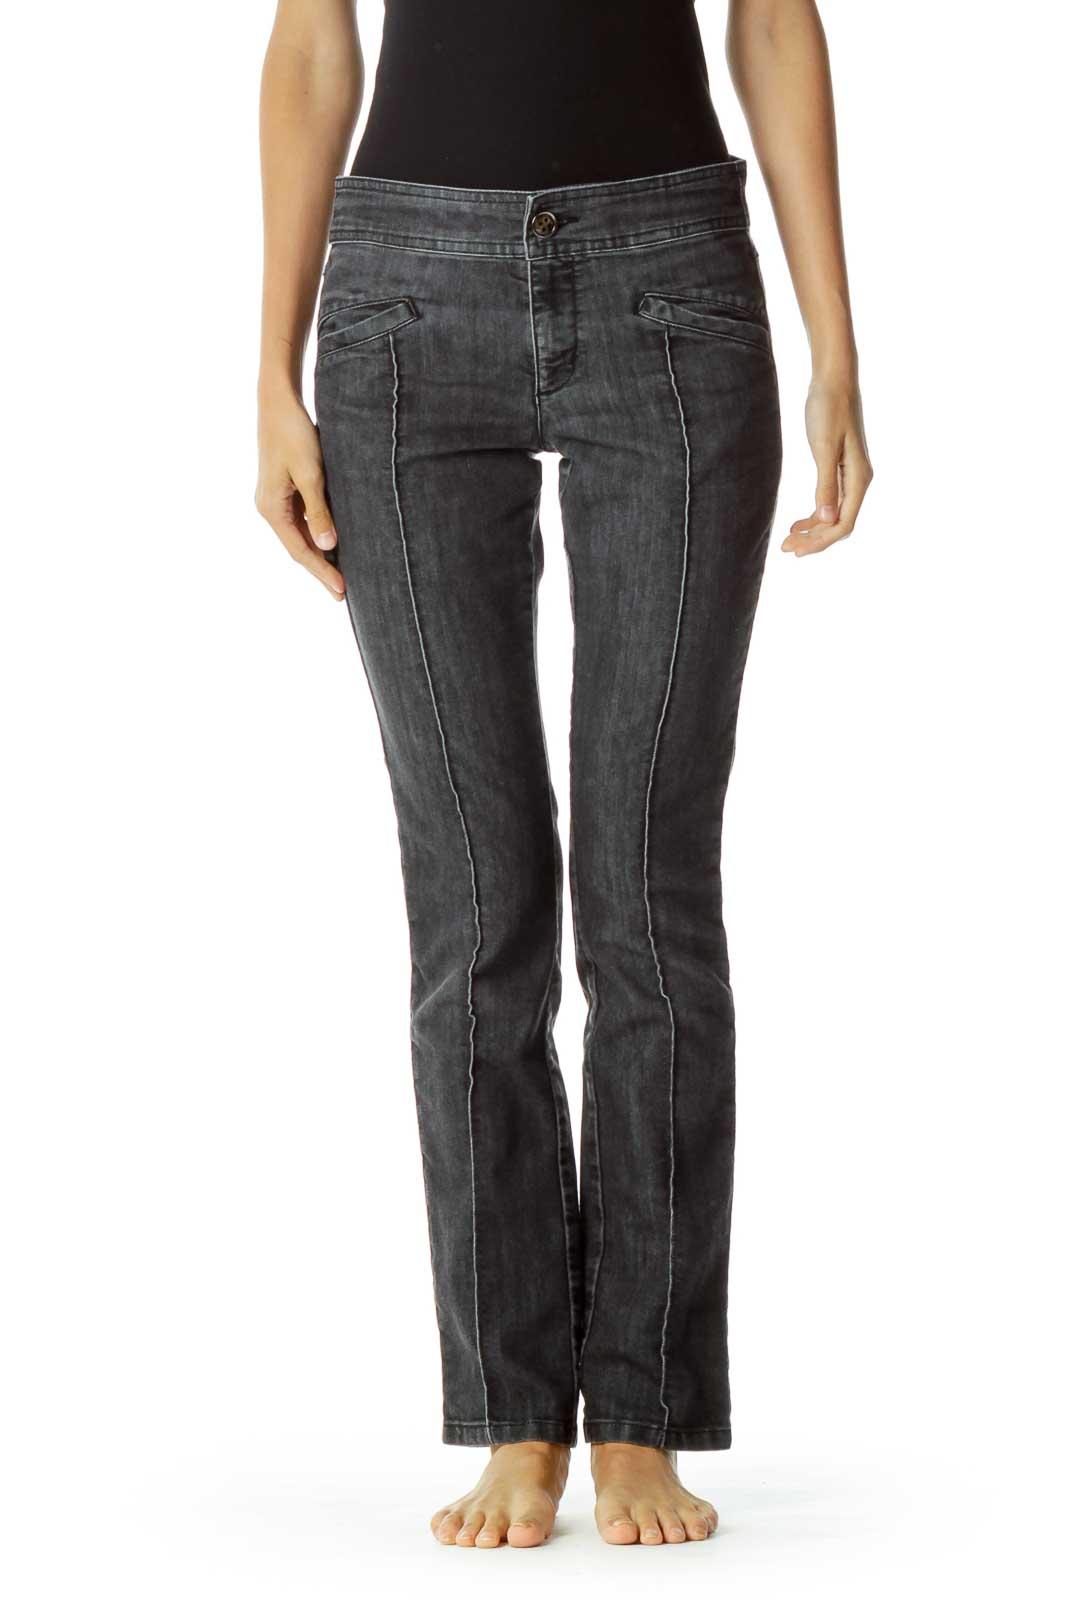 Black Denim Fold Detail Skinny Jeans Front